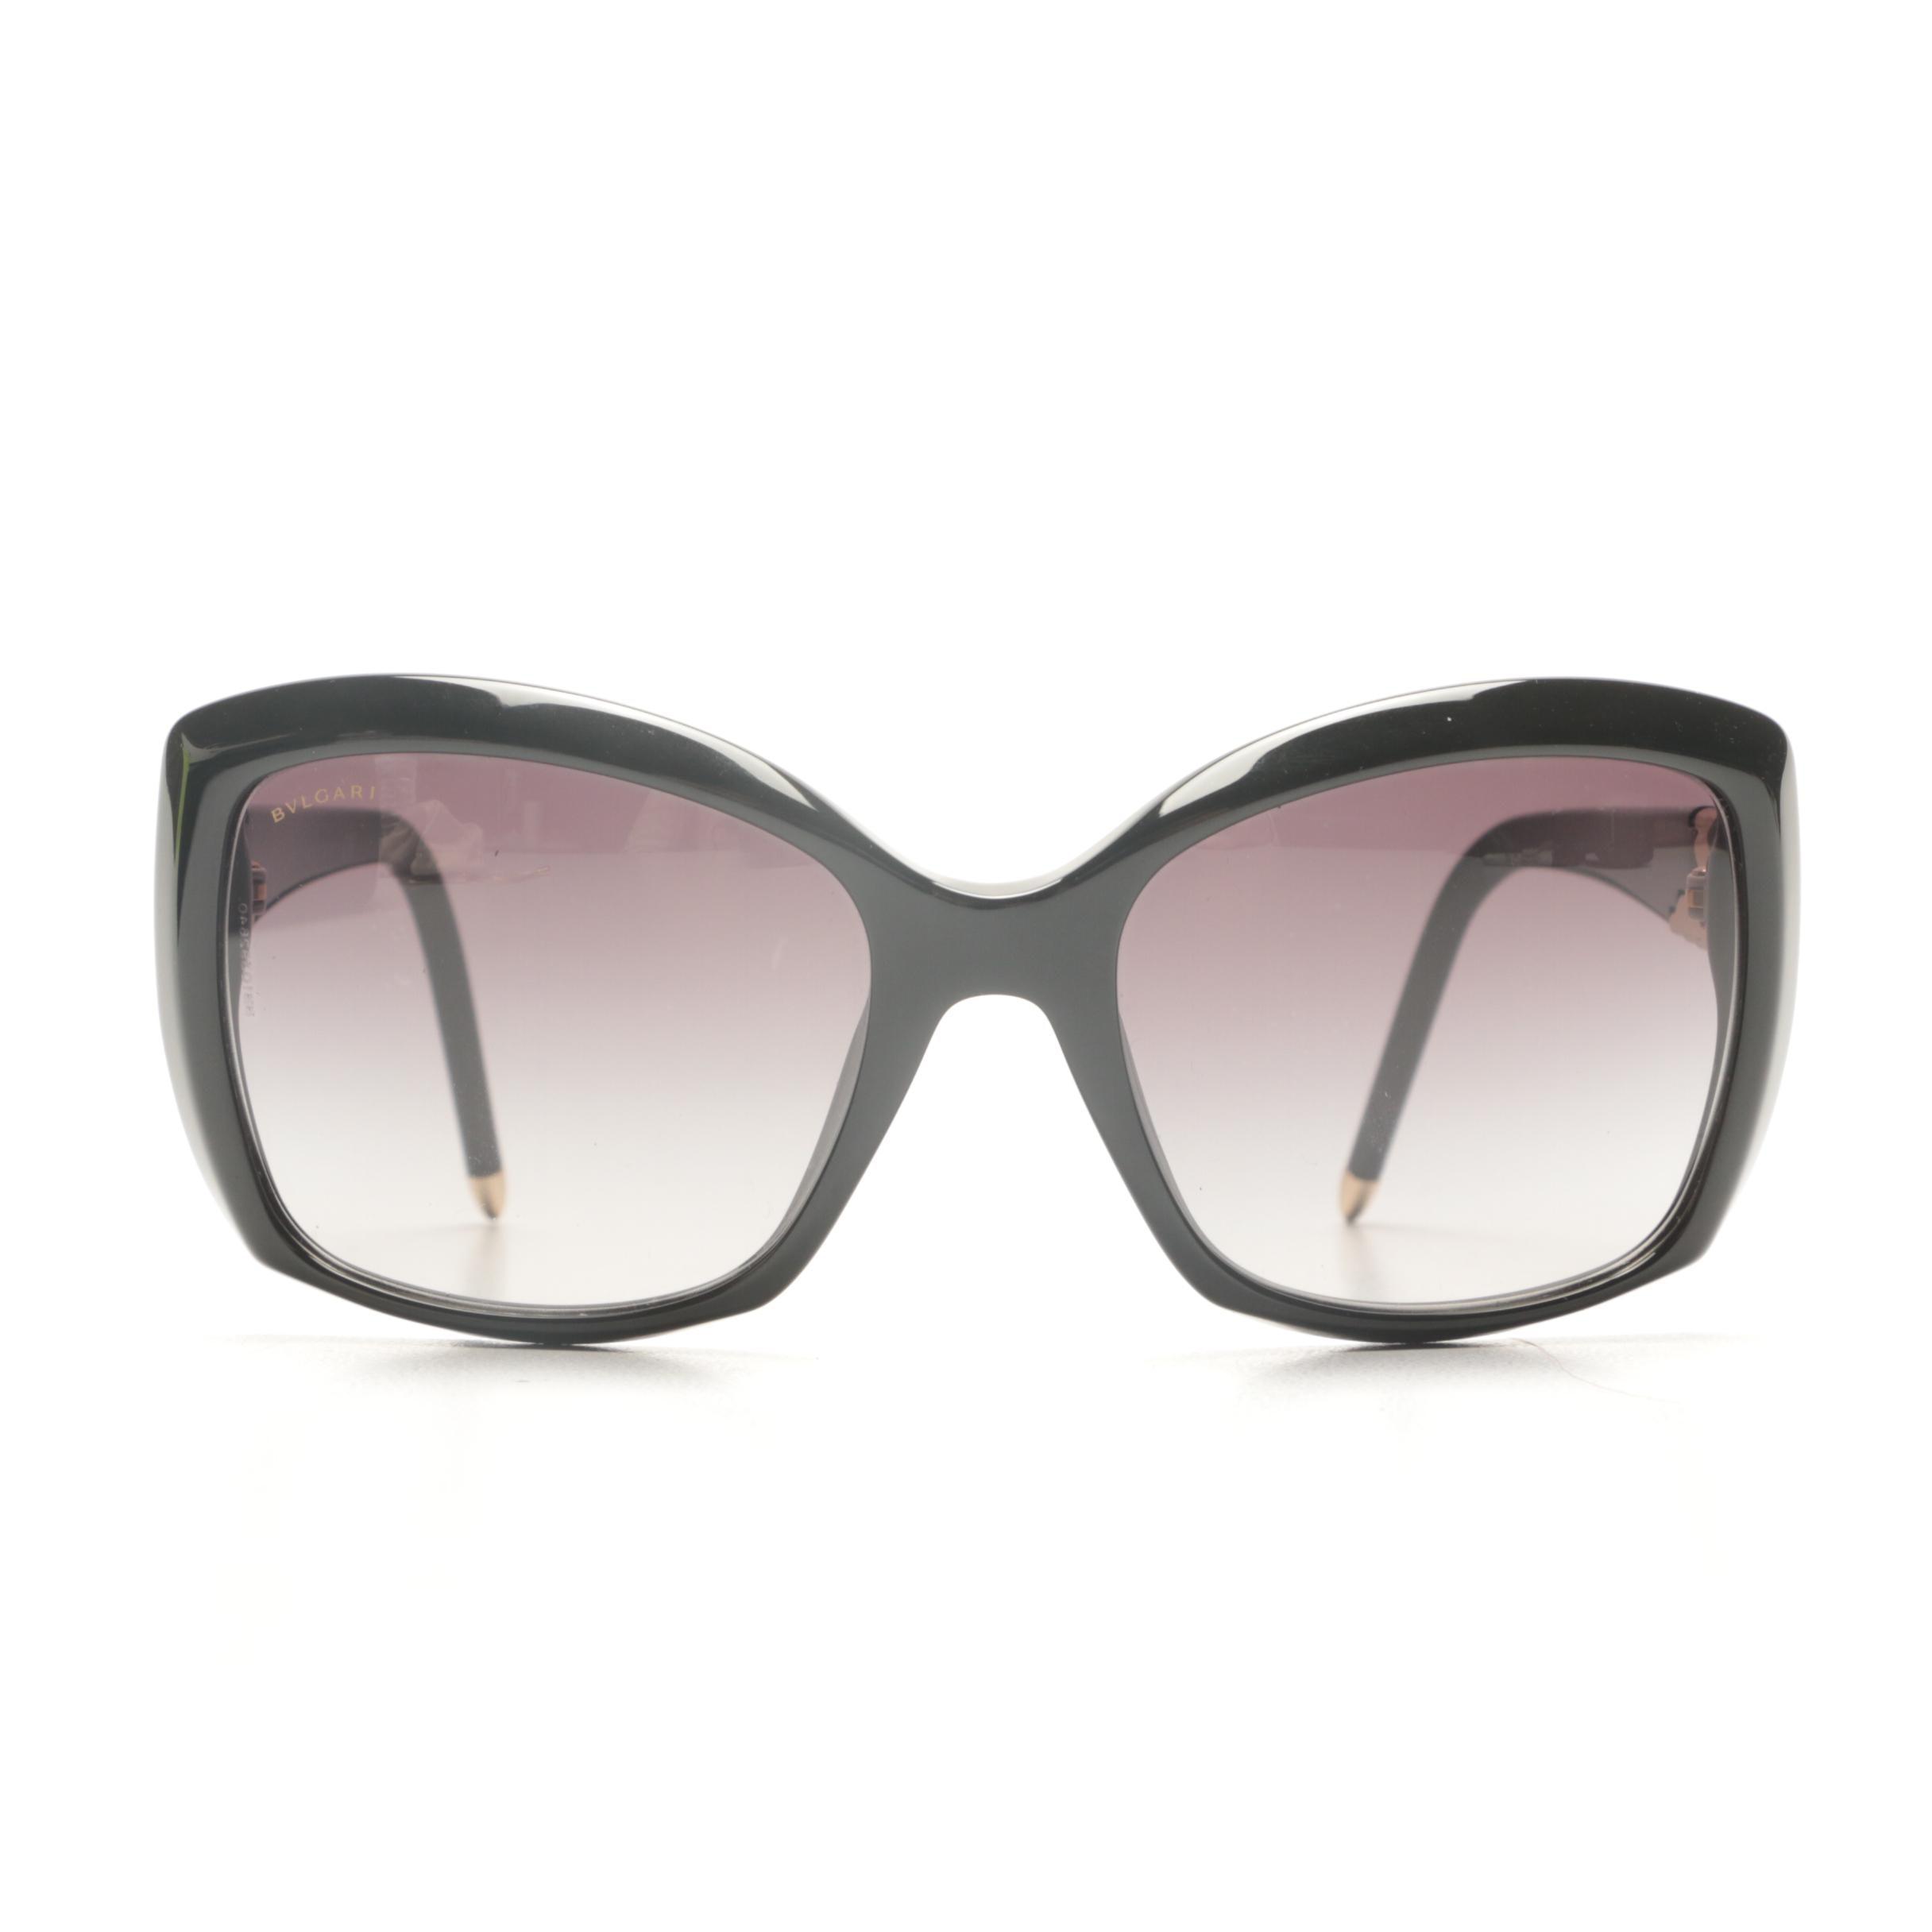 Bvlgari Serpenti Butterfly-Style Sunglasses